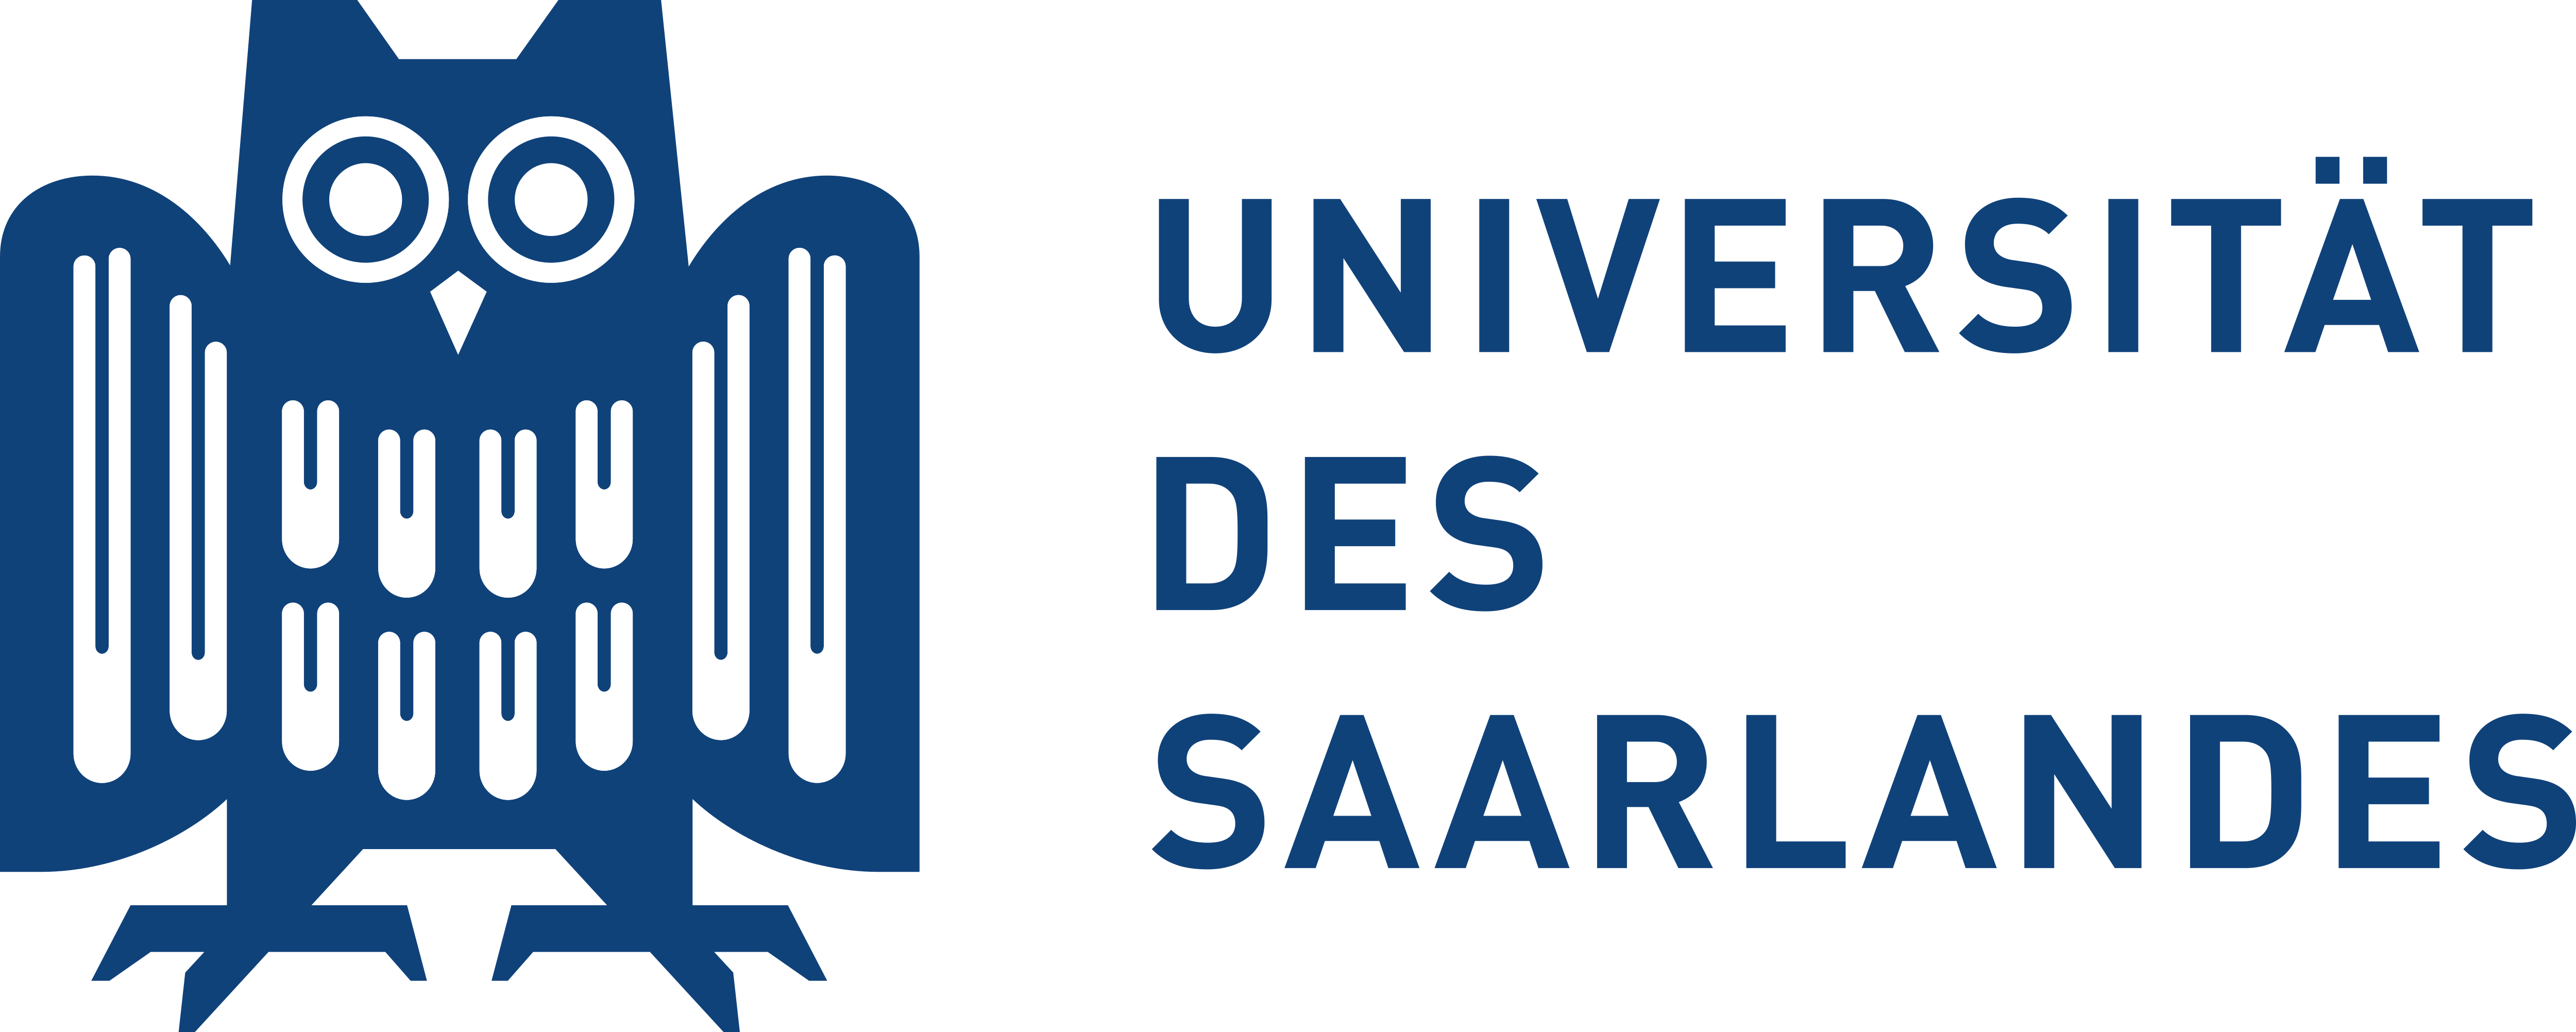 universitat des saarlandes � logos download